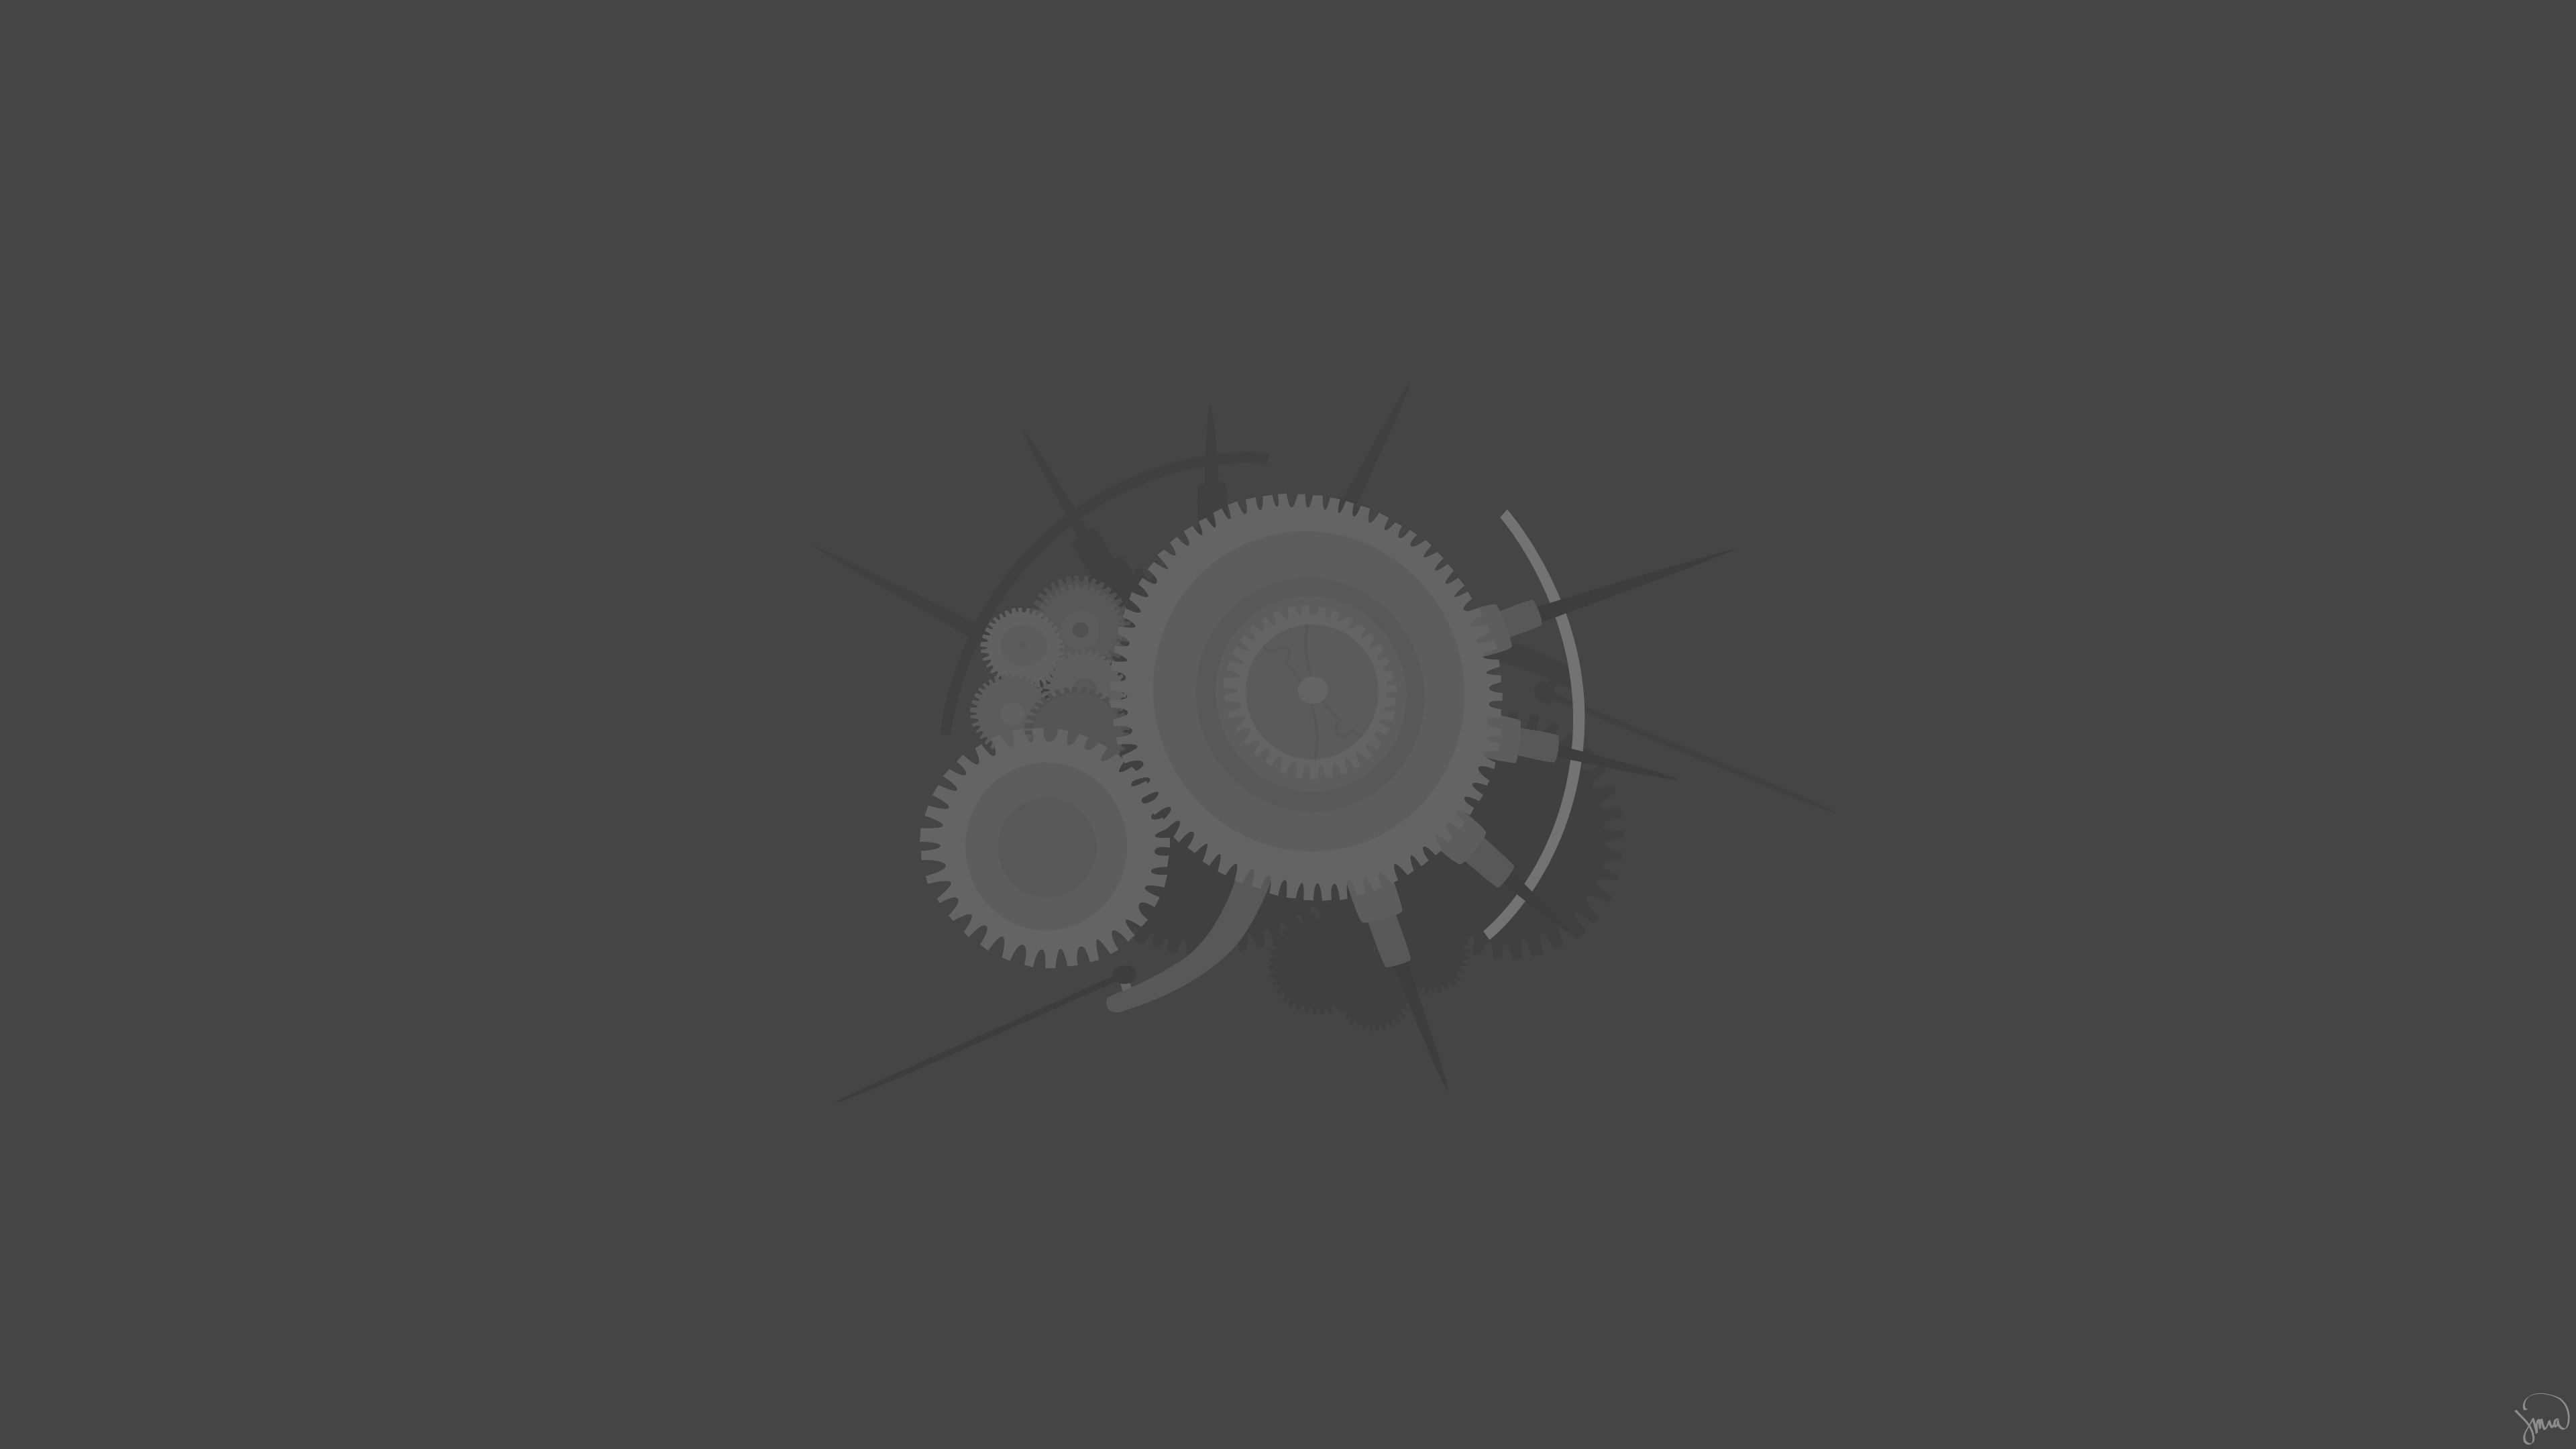 clockwork planet 1541974298 - Clockwork Planet - hd-wallpapers, clockwork planet wallpapers, anime wallpapers, 4k-wallpapers